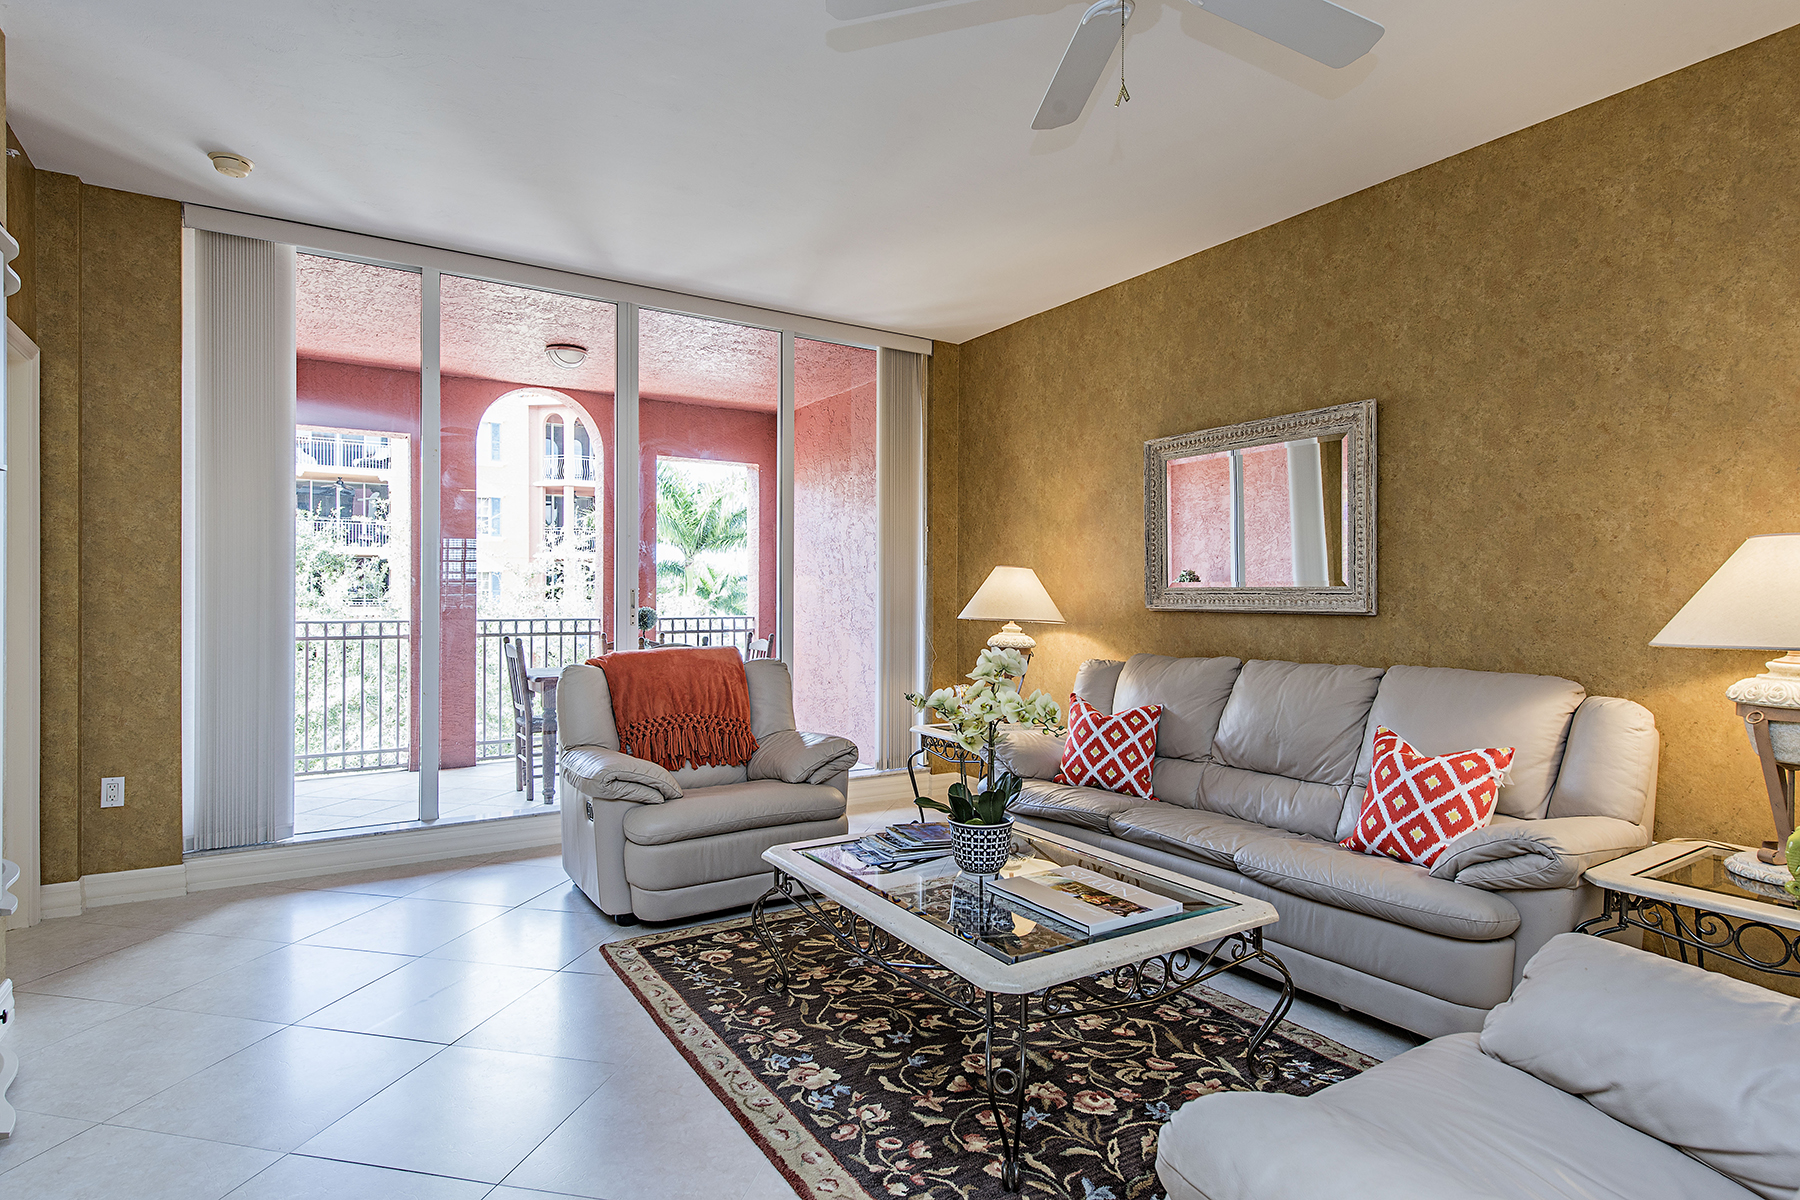 Condominium for Sale at BAYFRONT 401 Bayfront Pl 3302 Naples, Florida, 34102 United States